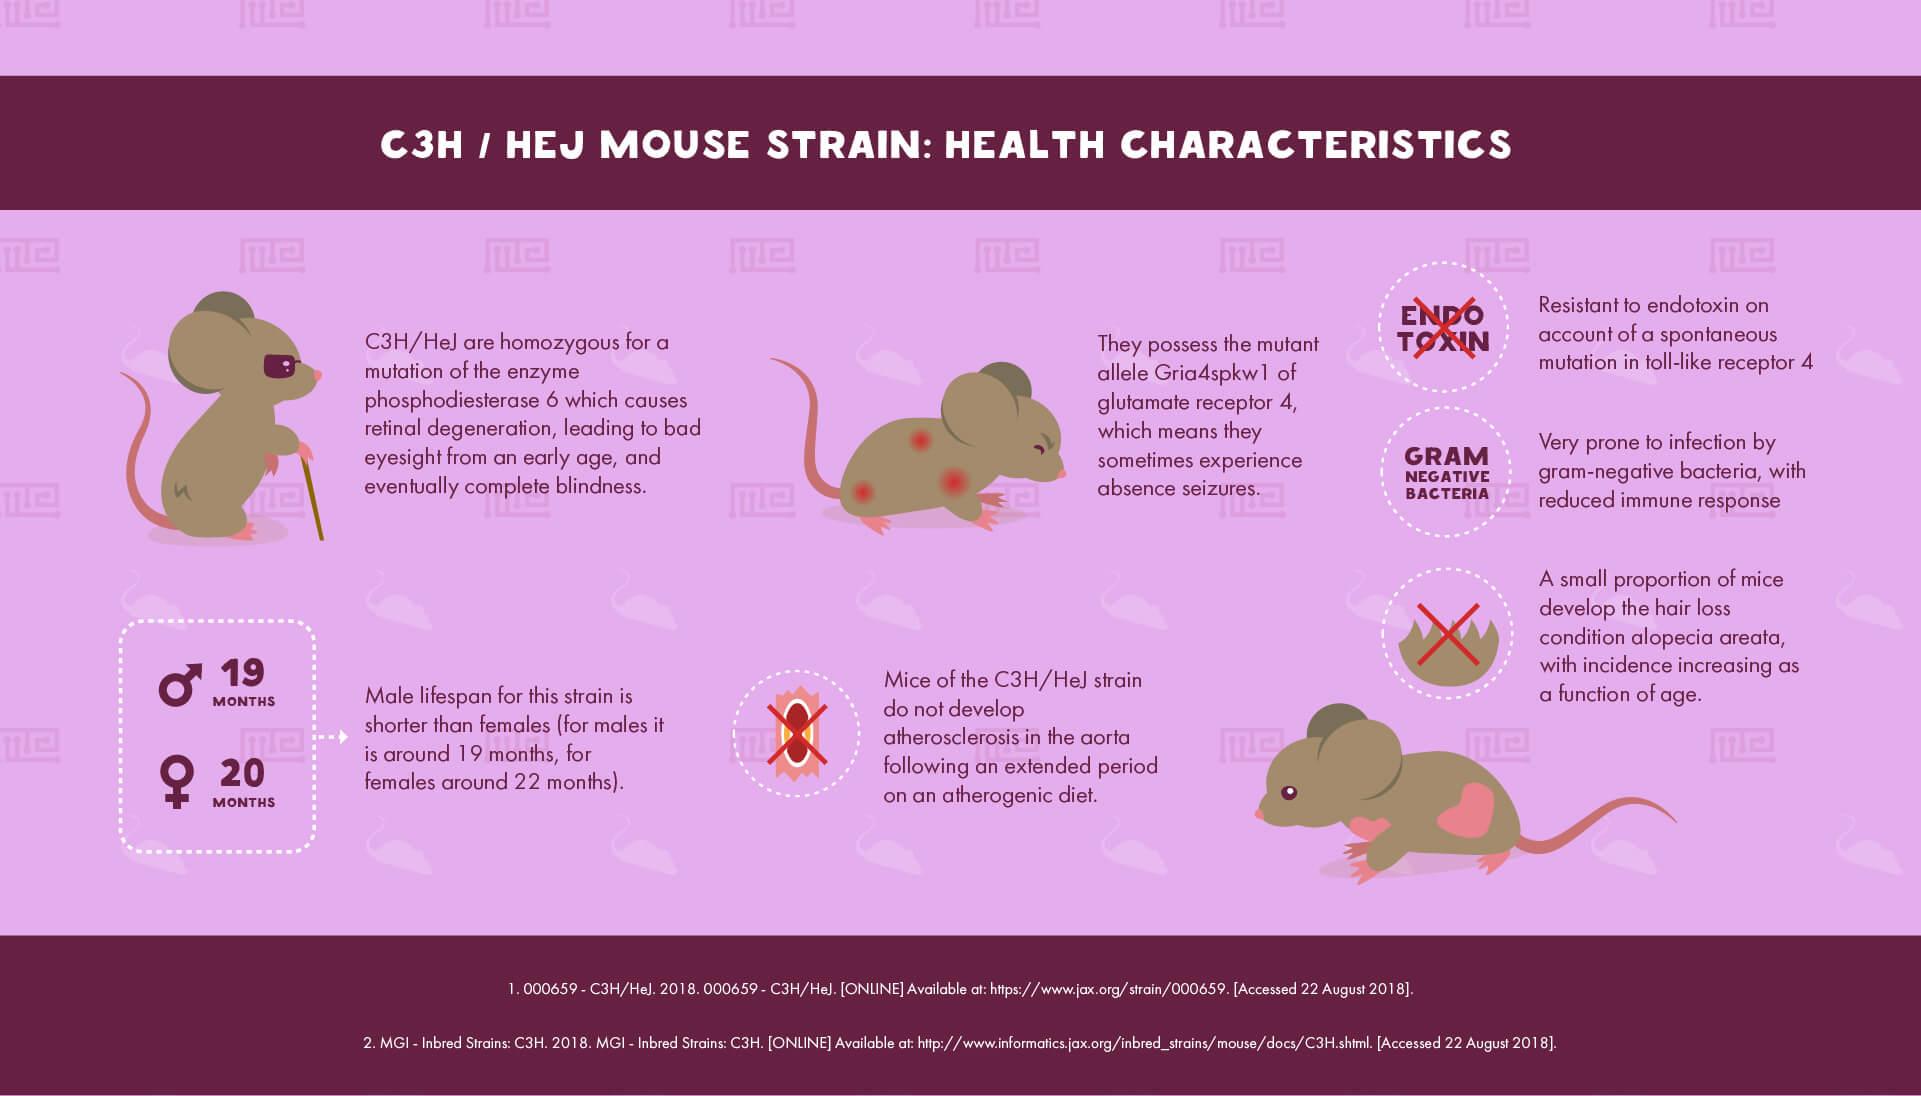 C3H/HeJ Mouse Strain : Health Characteristics